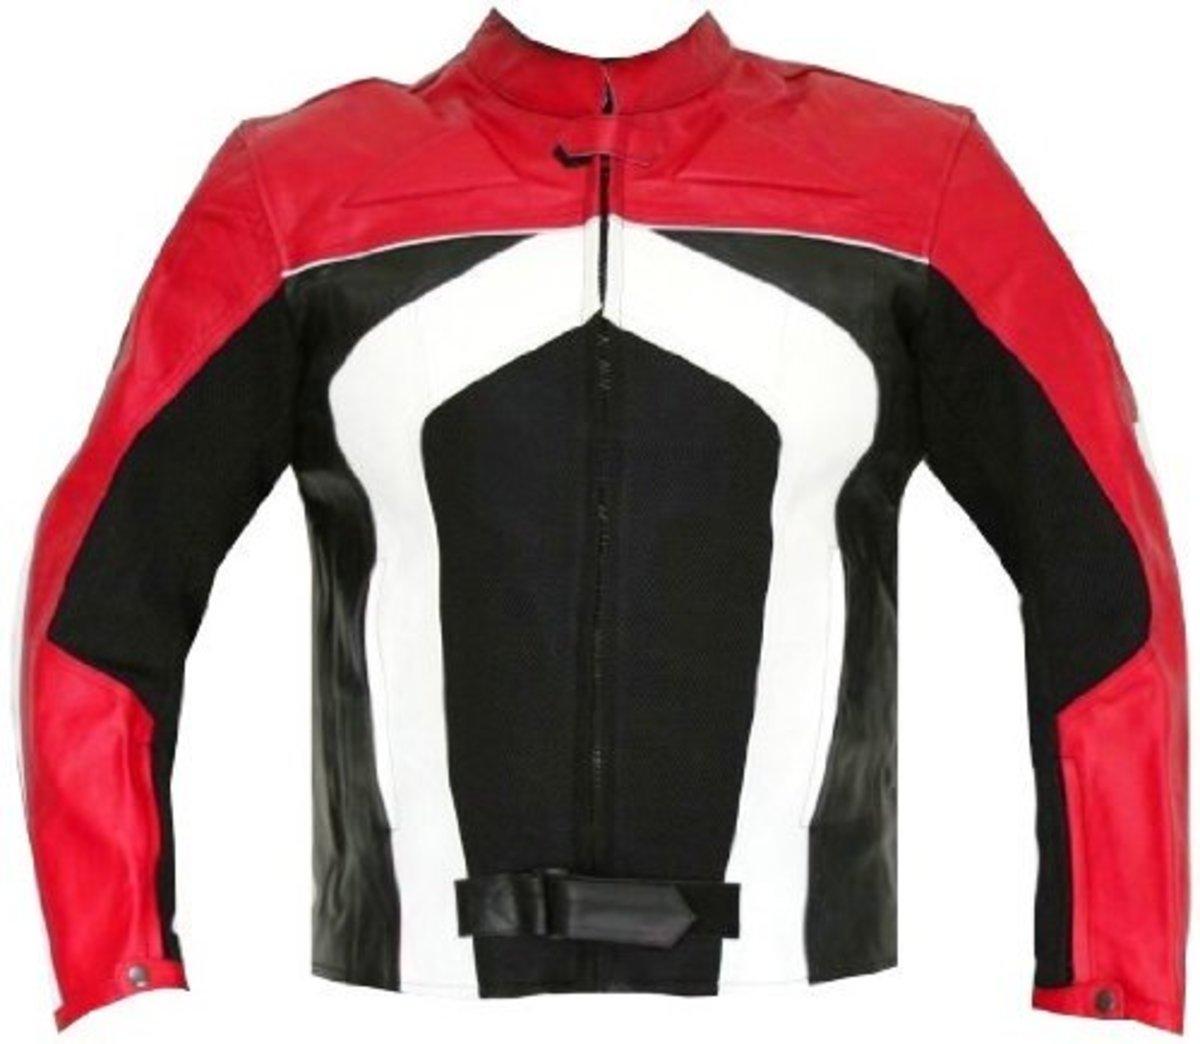 Razer Armor leather motorcycle jacket